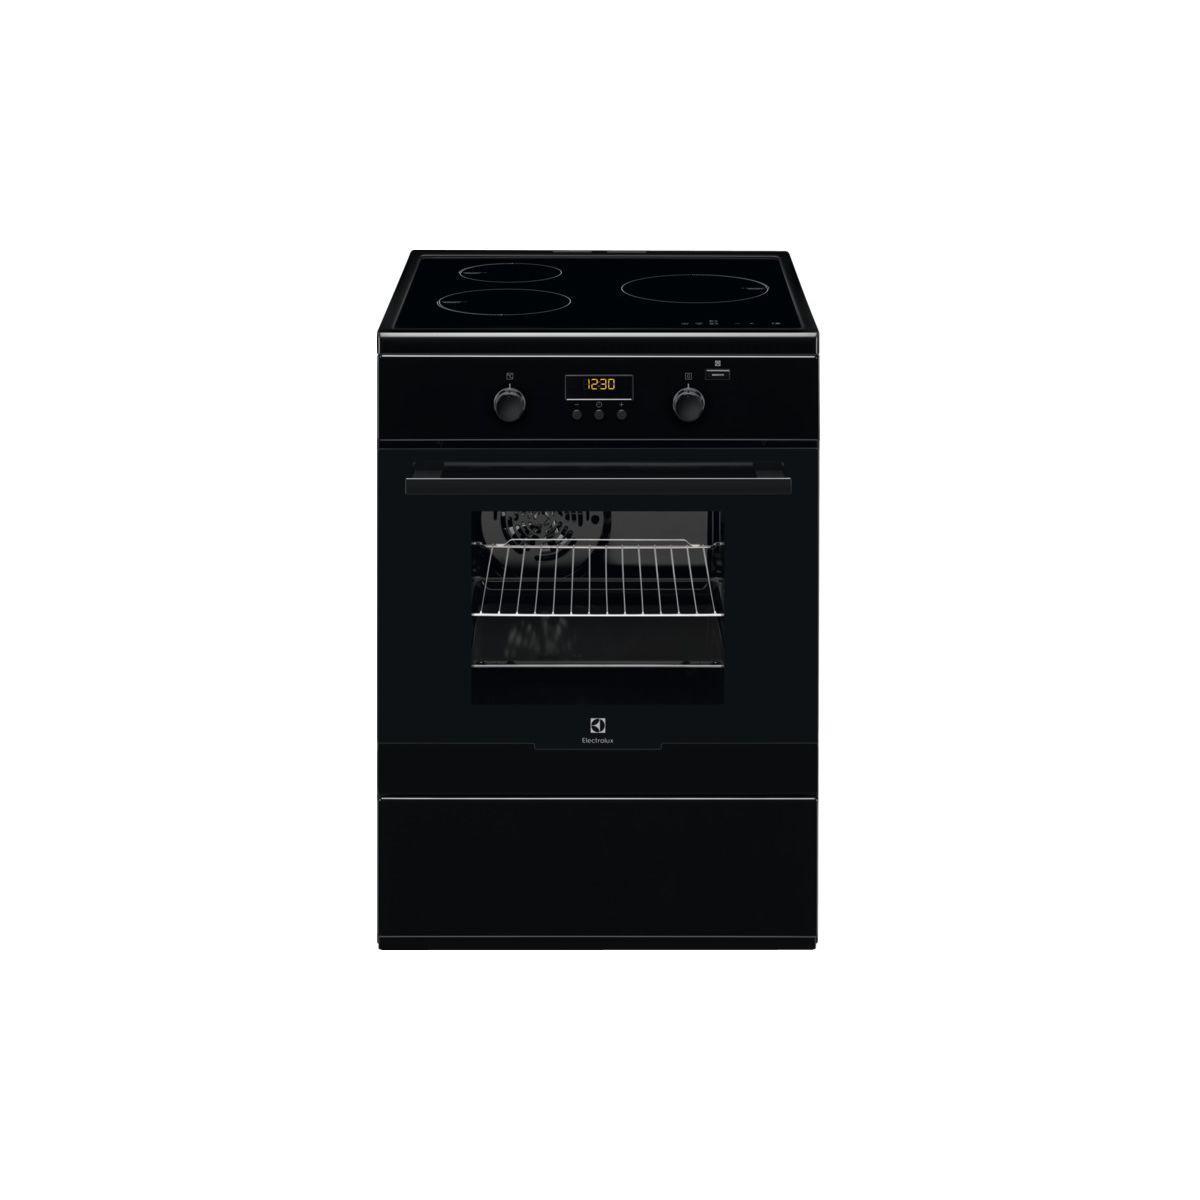 Cuisinière induction ELECTROLUX EKI64900OK